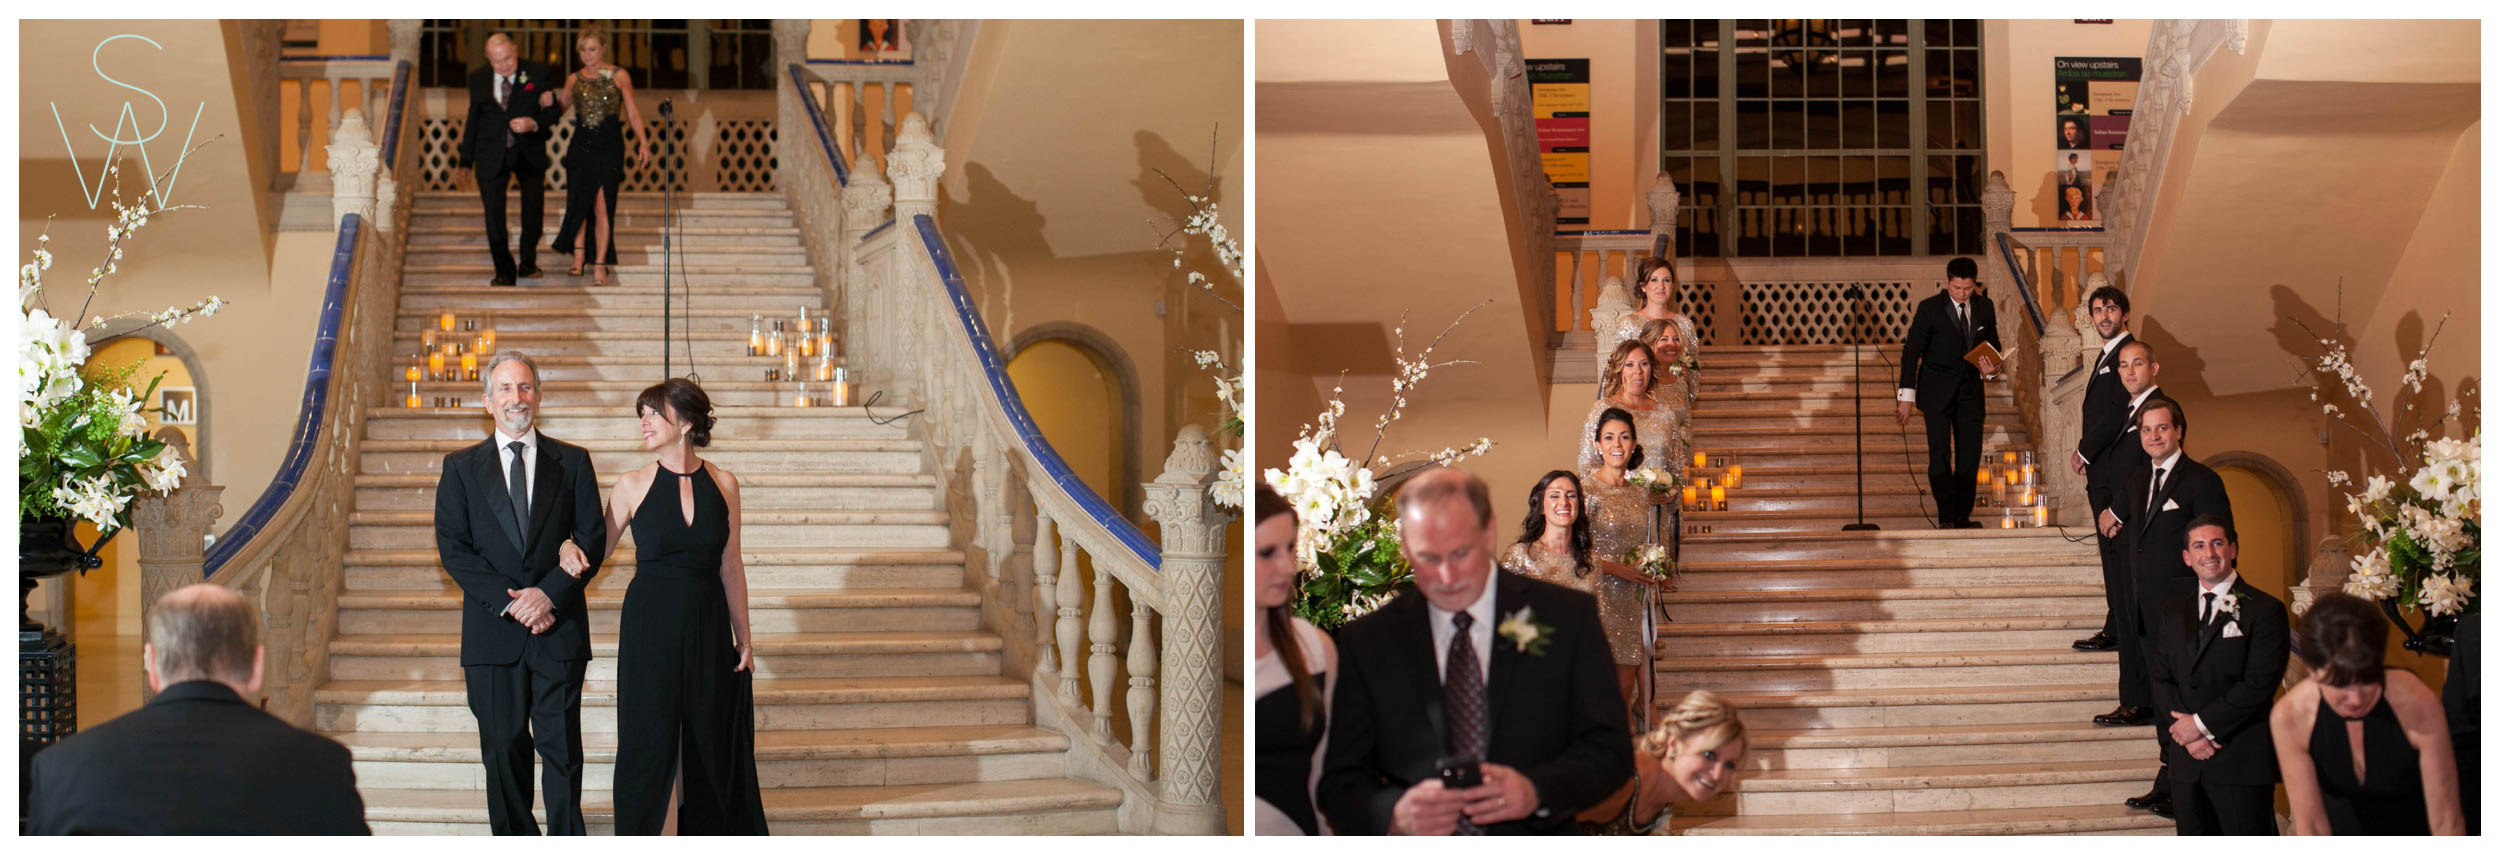 Shewanders.sdma_.wedding.photography-1048.jpg.wedding.photography-1048.jpg